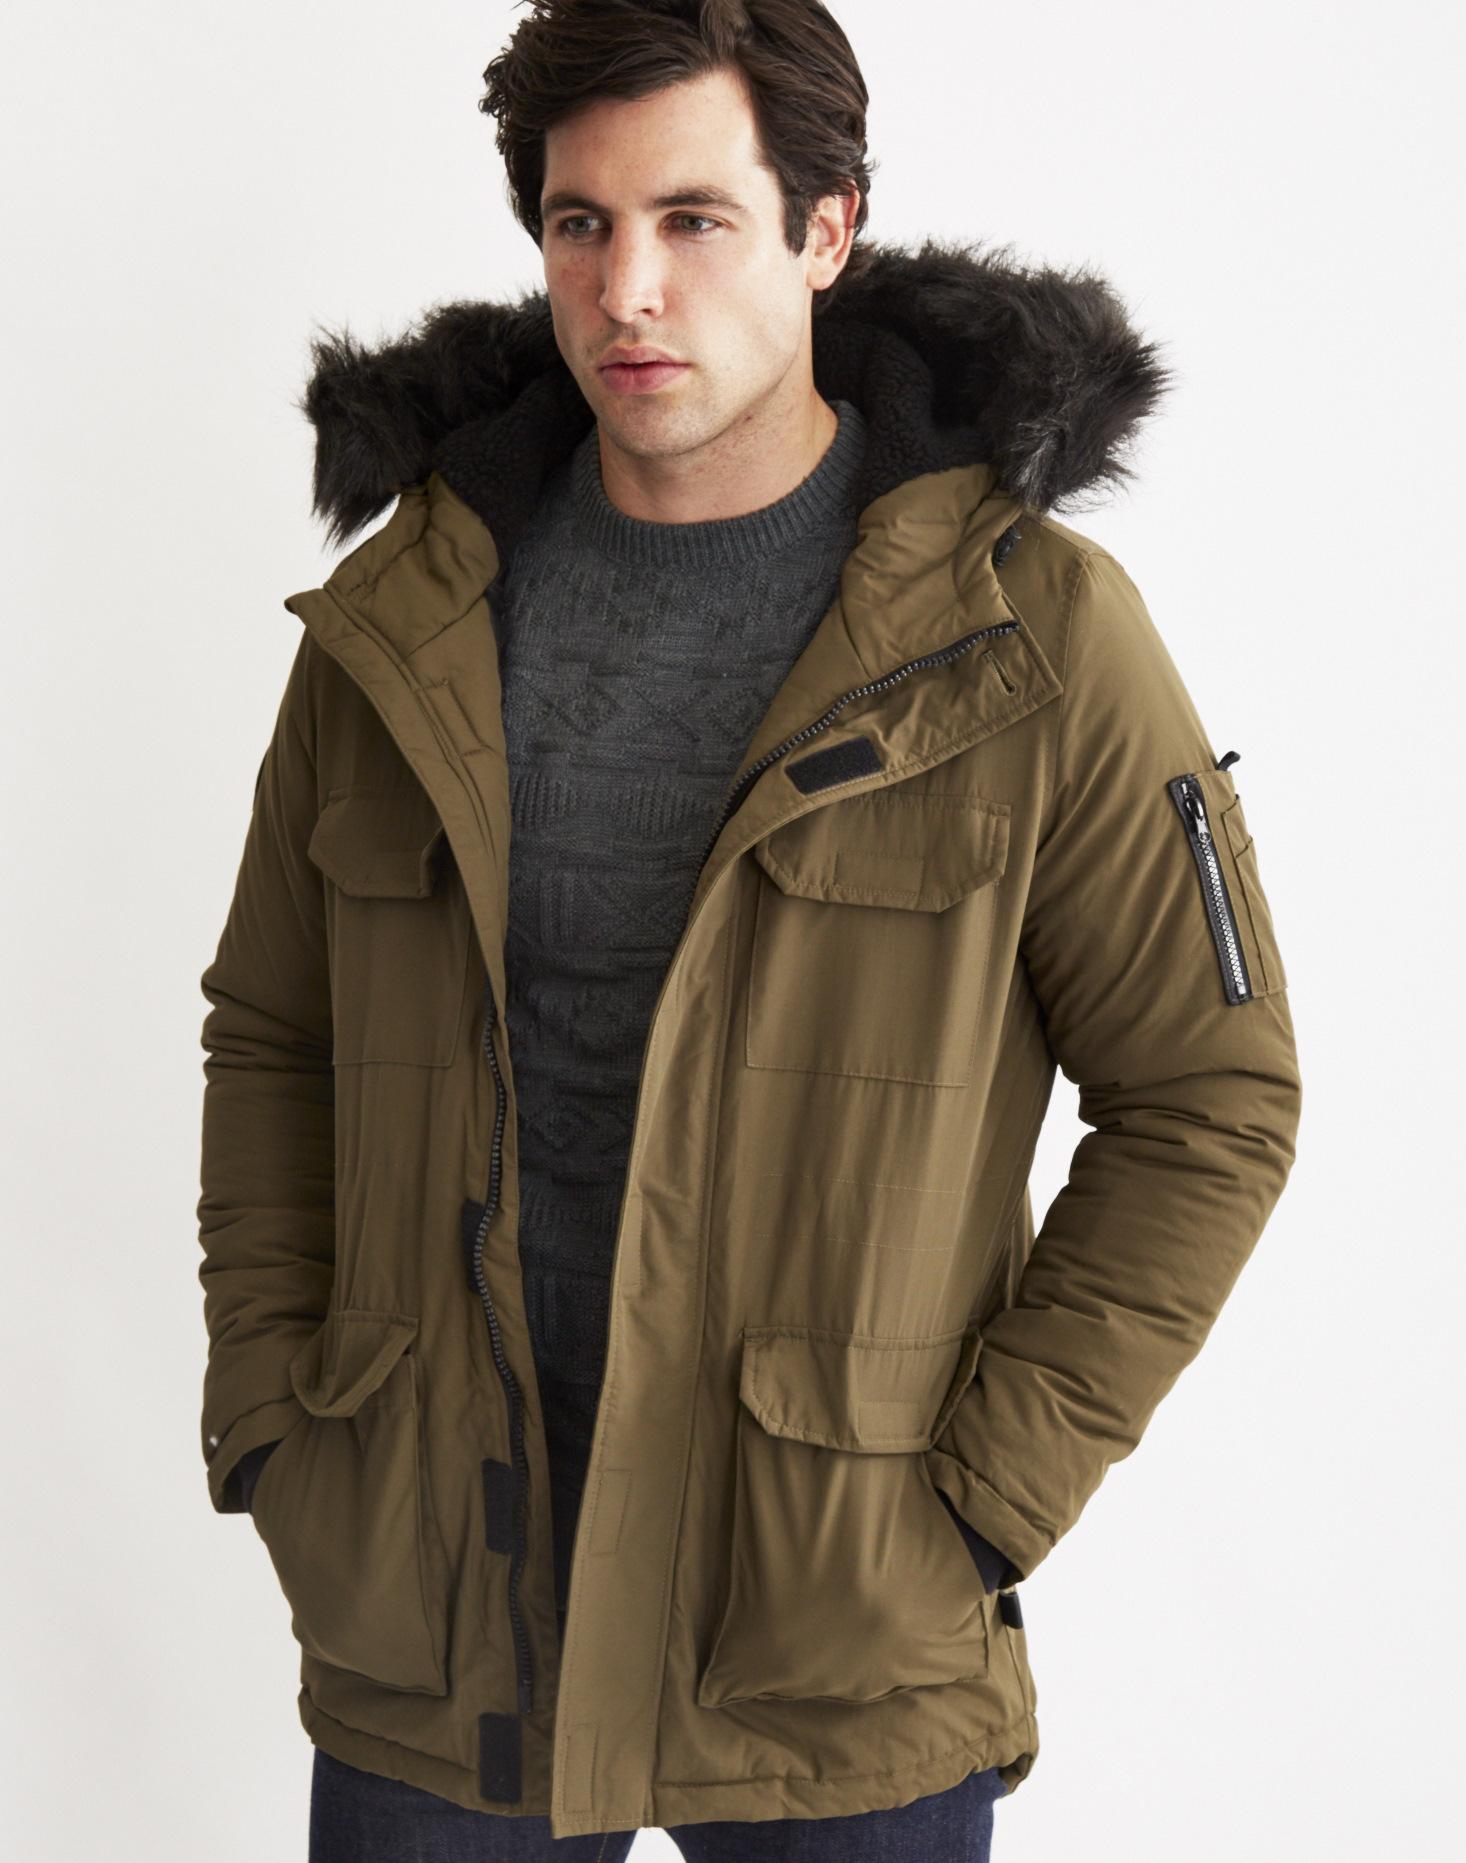 abb1348473 Bellfield Nimrod Fur-Trimmed Parka Jacket in Natural for Men - Lyst